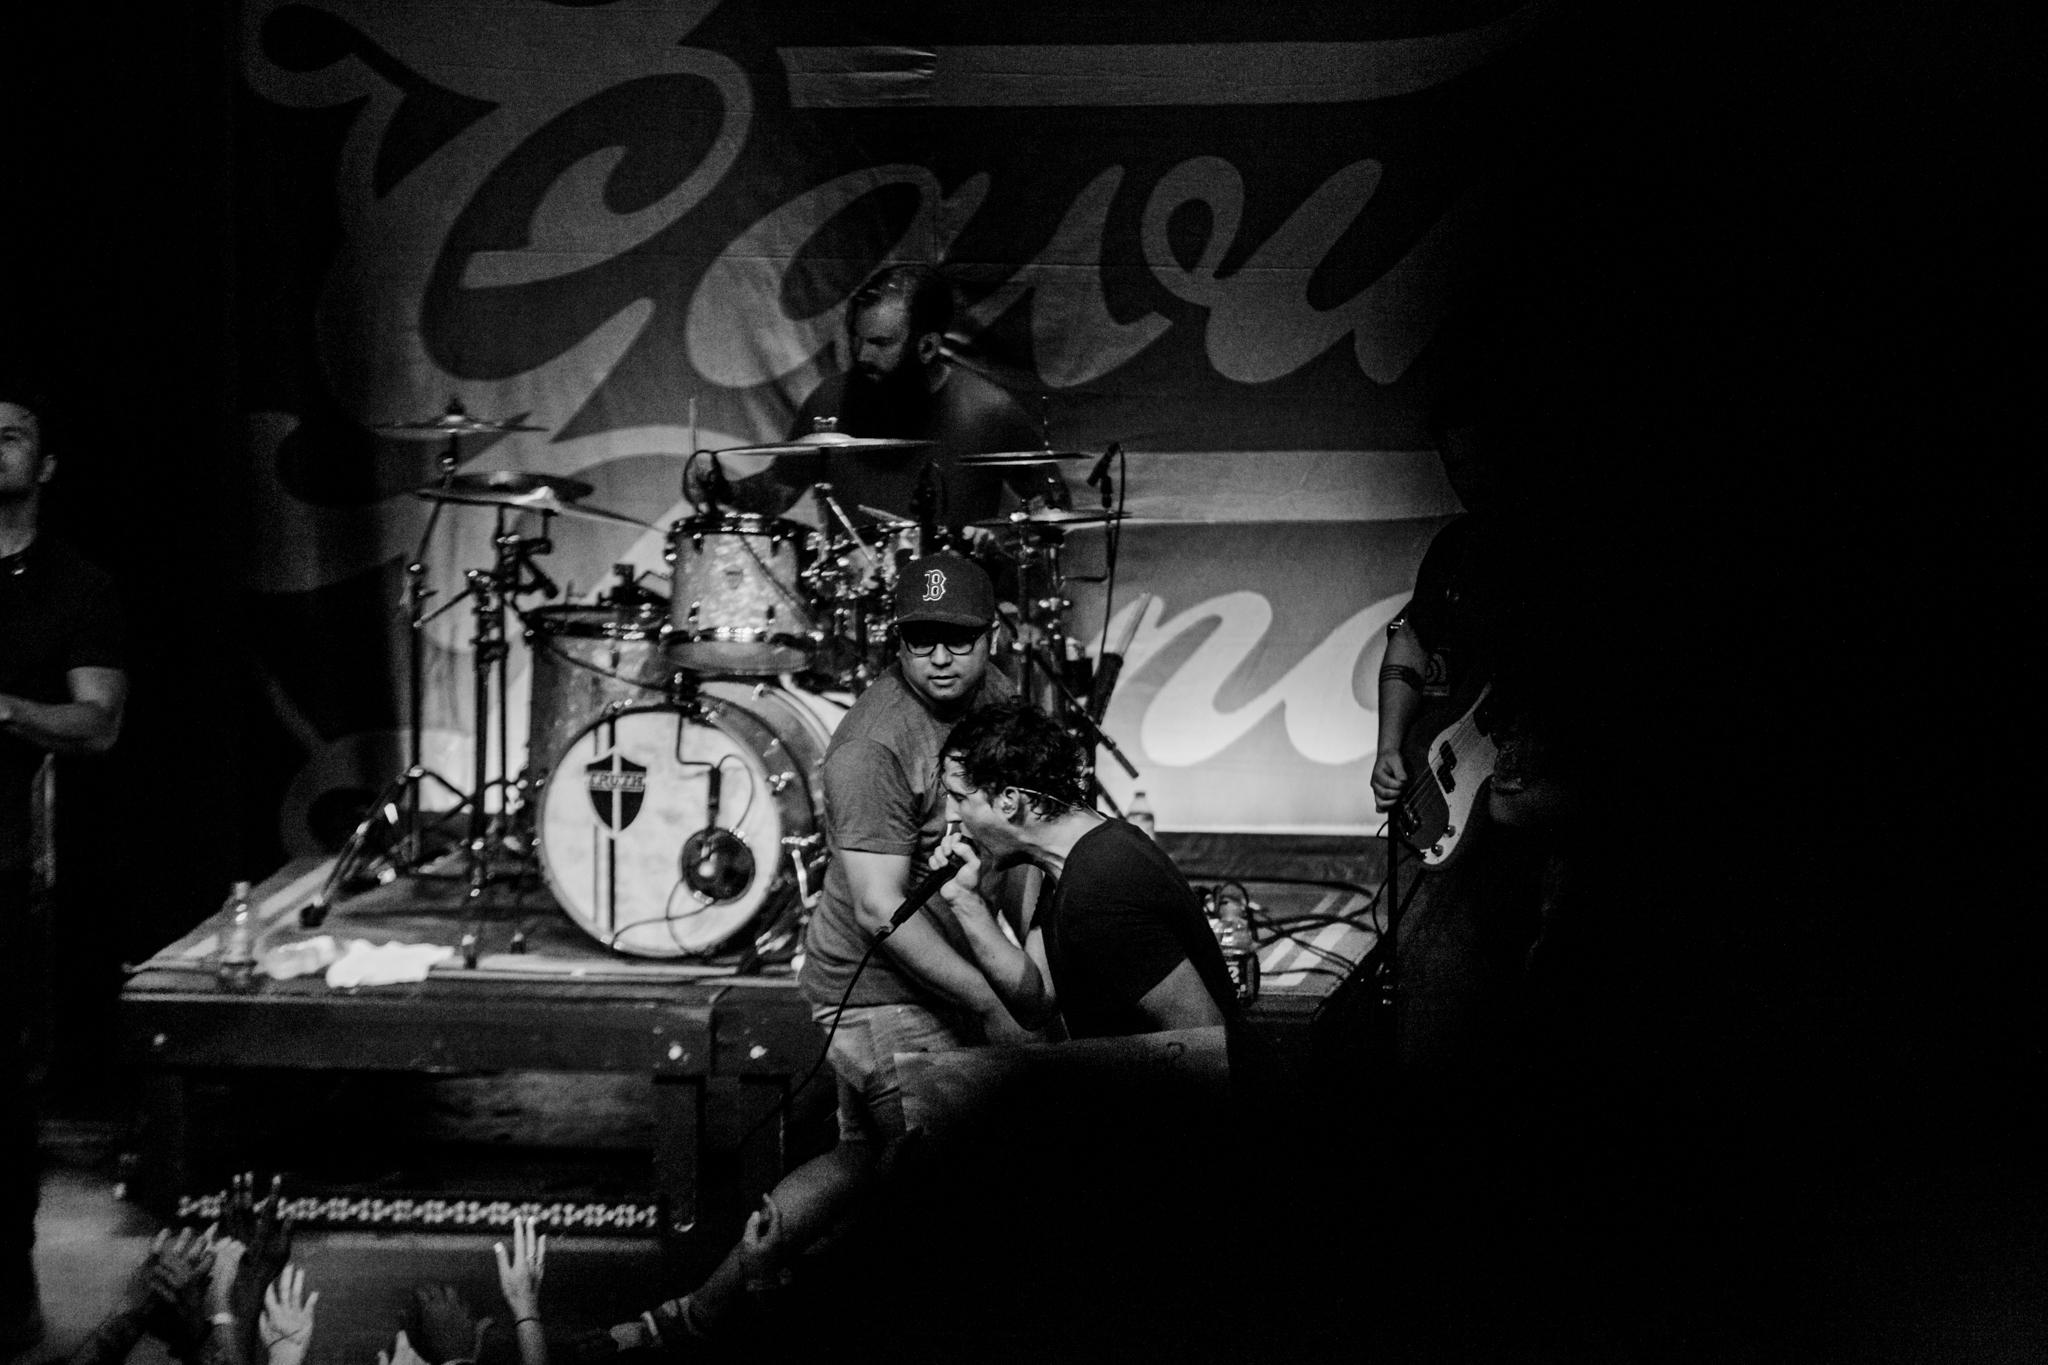 Lafferty Photo - Dance Gavin Dance 03.08.17-8757.jpg